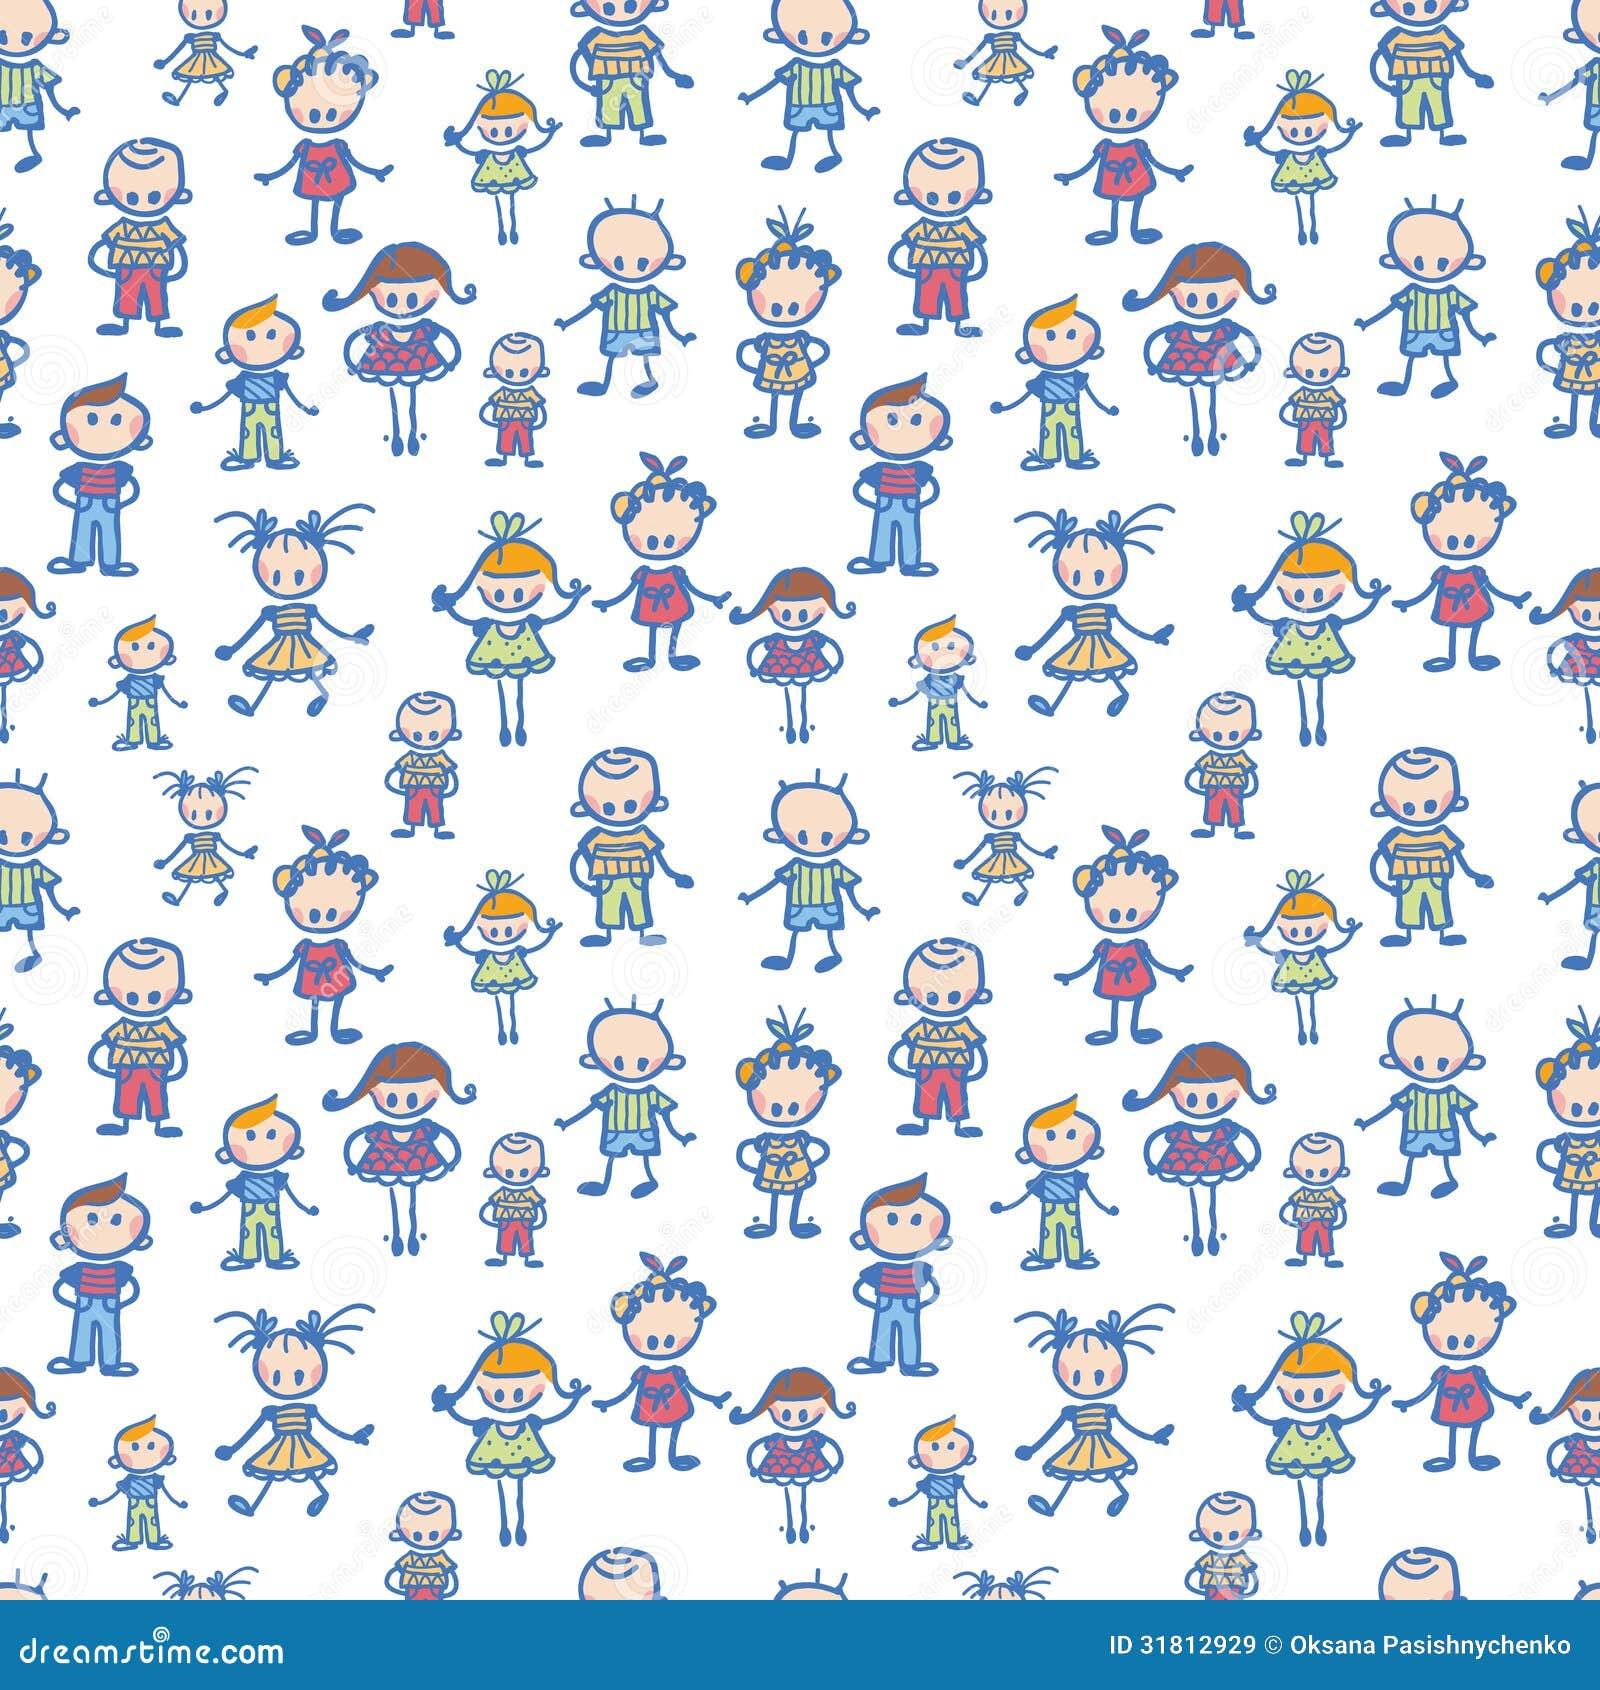 printable dollhouse wallpaper free